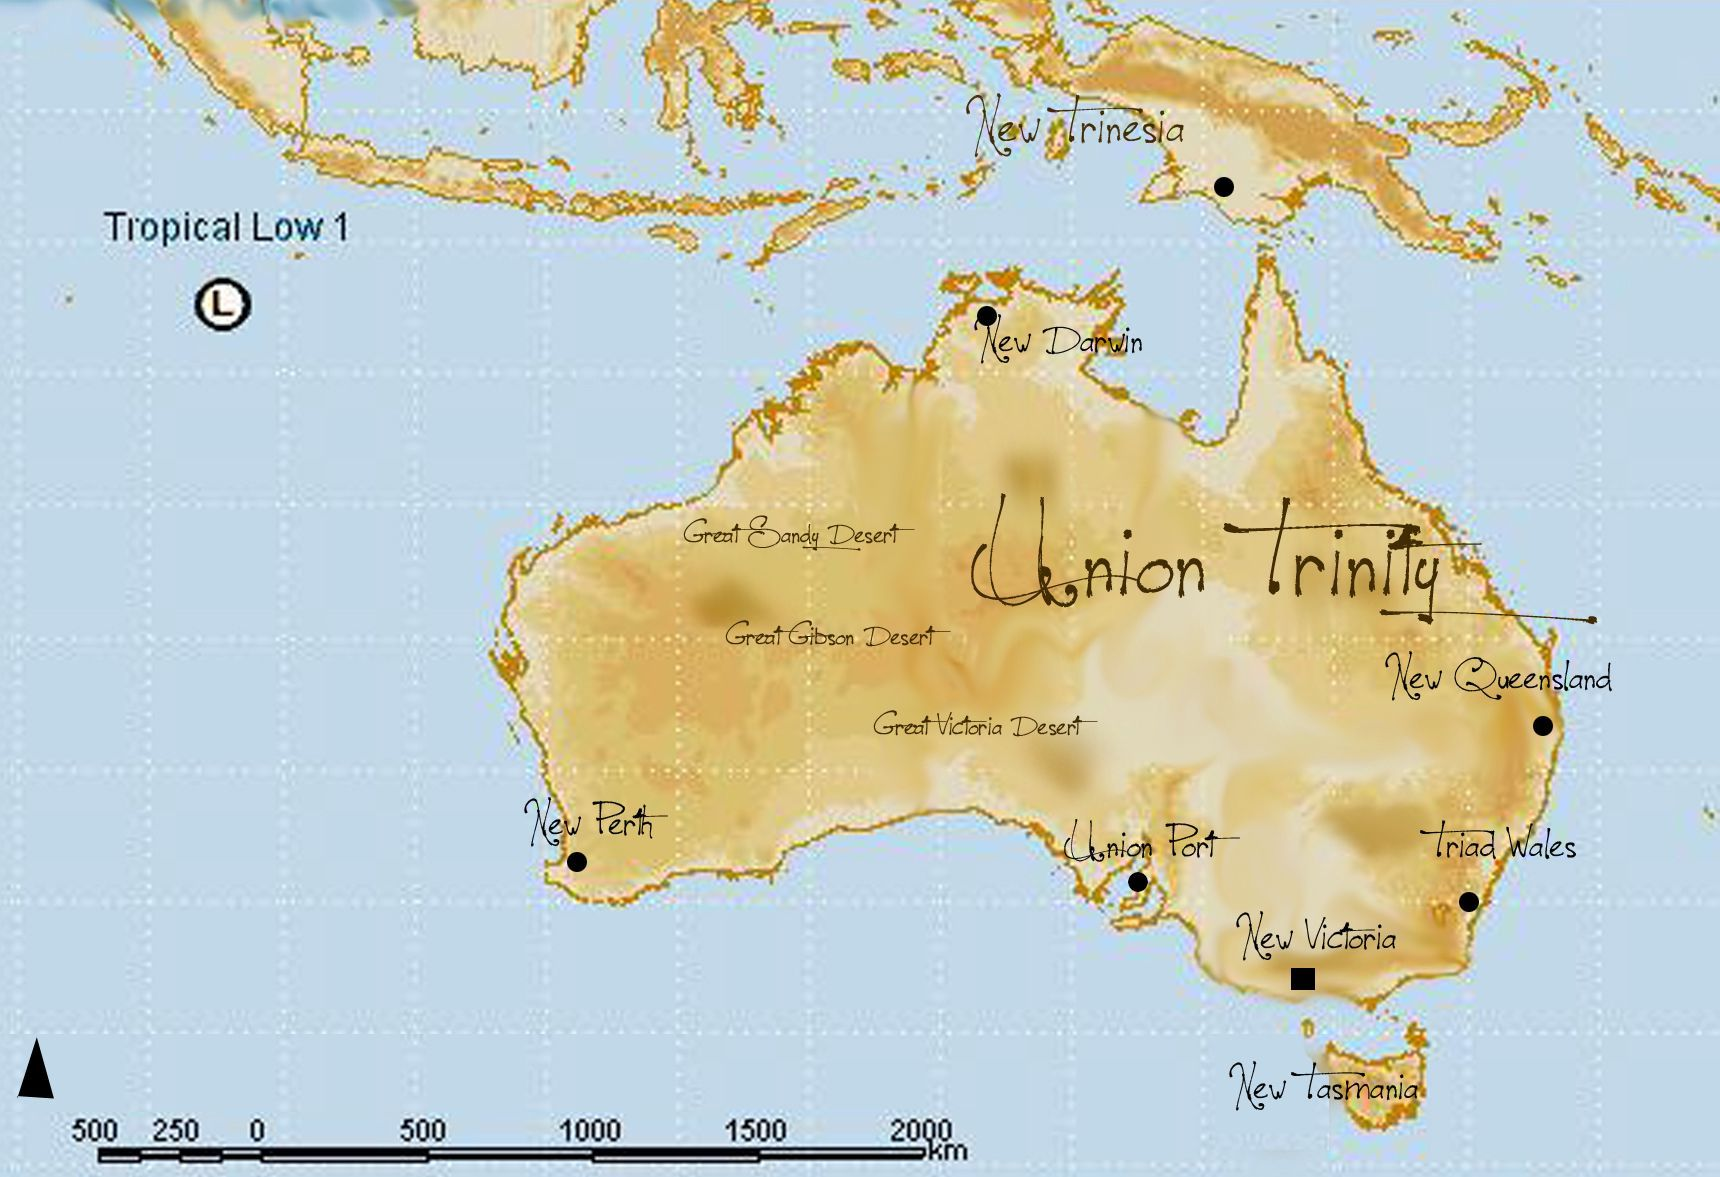 Union Trinity (UT)